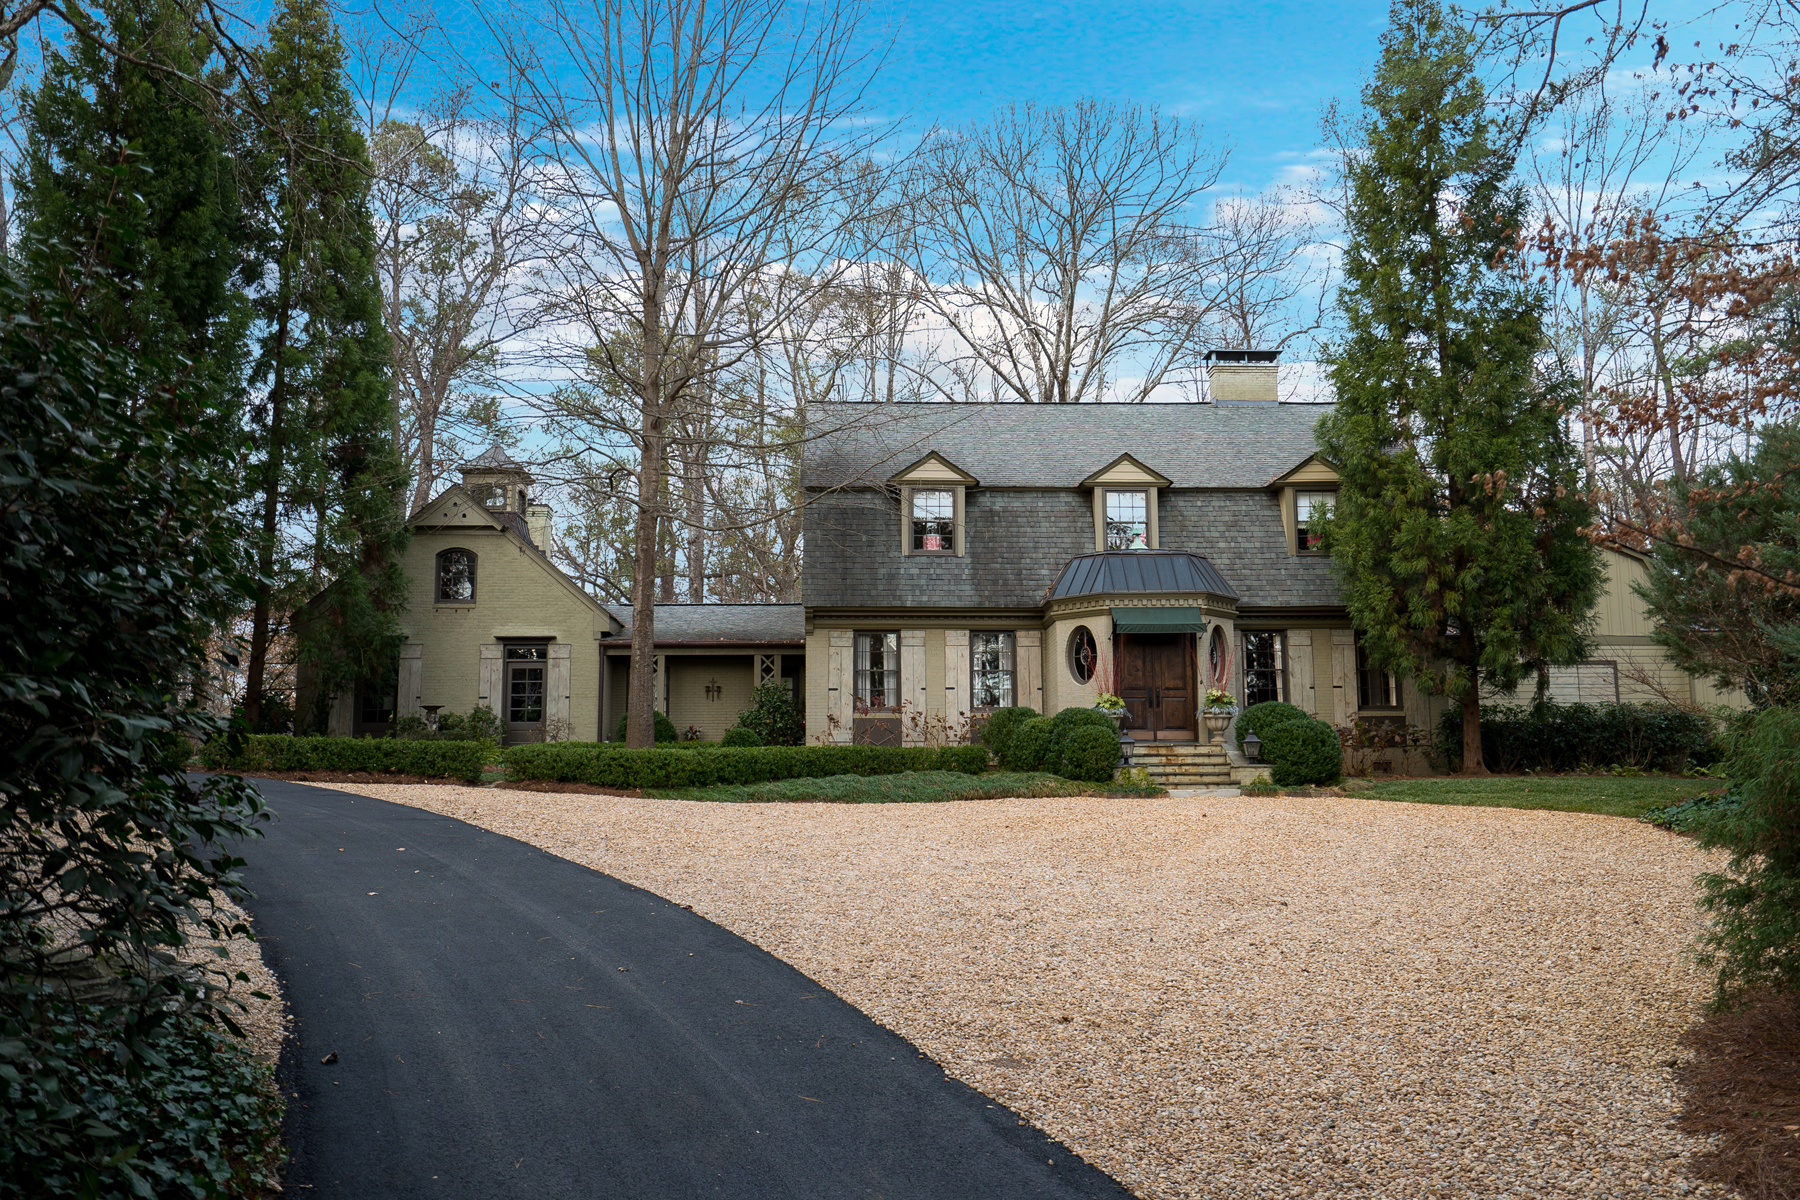 Частный односемейный дом для того Продажа на Sophisticated Chastain Park Home 537 Hillside Drive NW Chastain Park, Atlanta, Джорджия, 30342 Соединенные Штаты